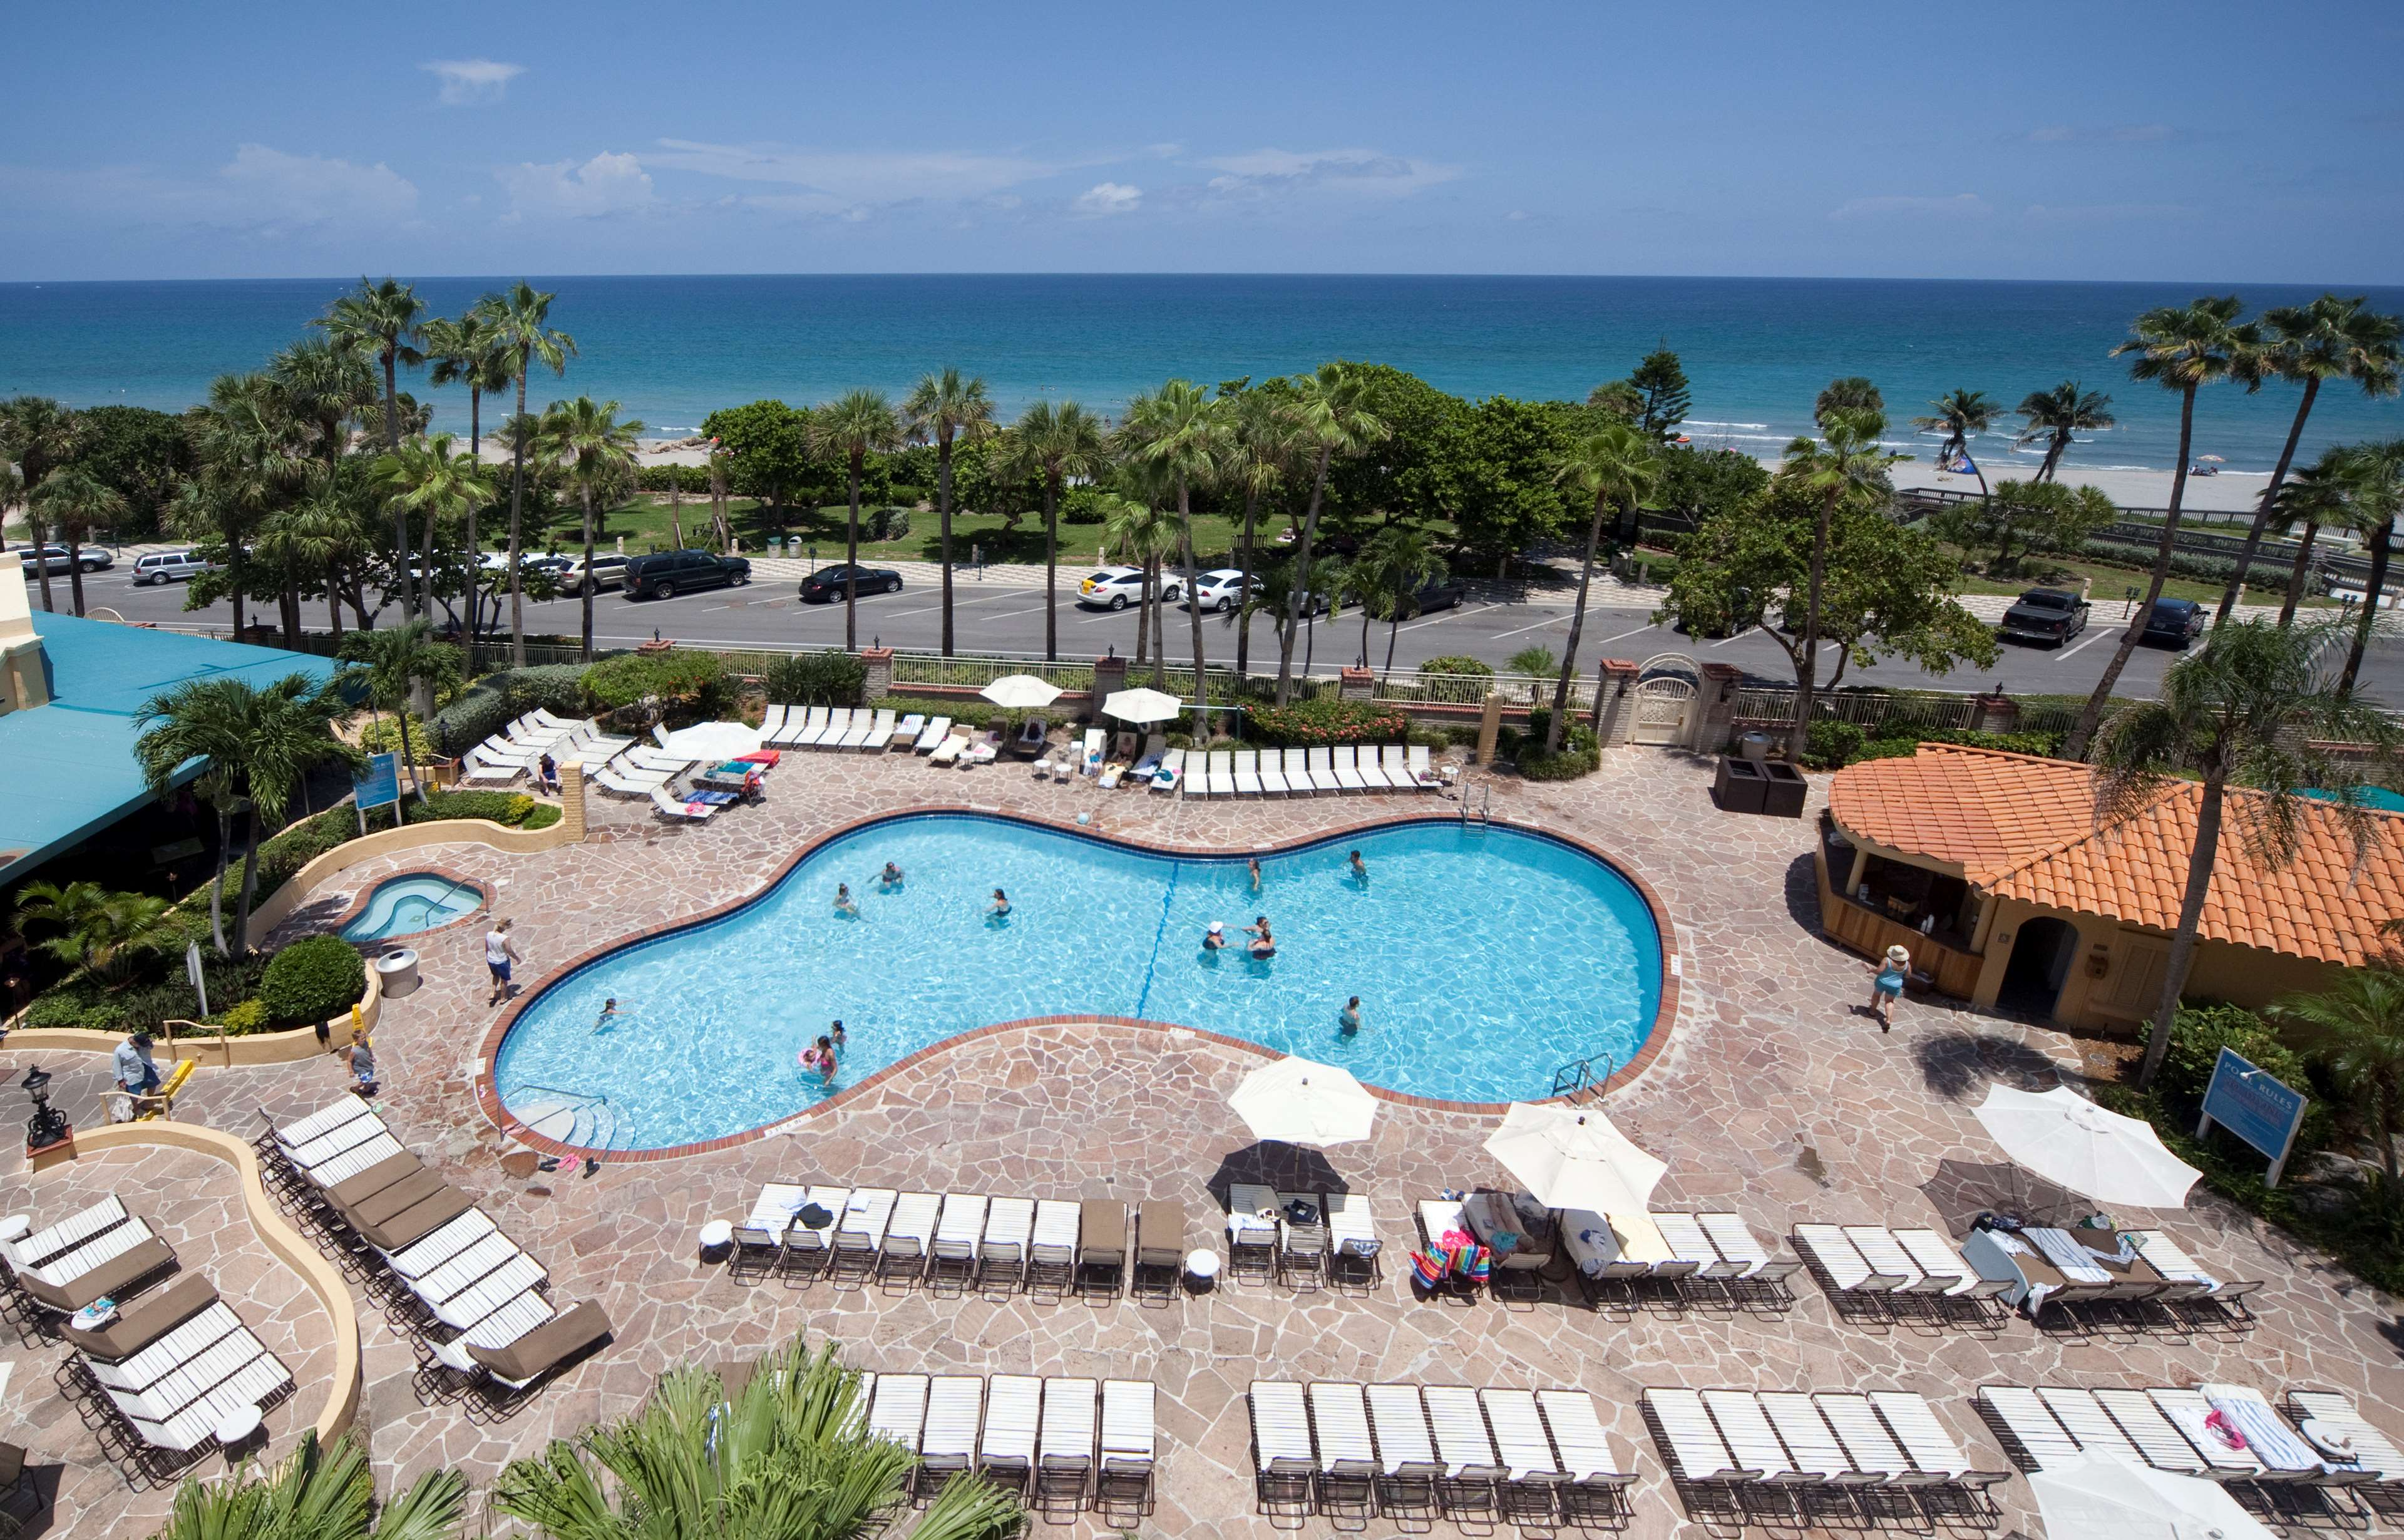 Hotels In Deerfield Beach Florida Area